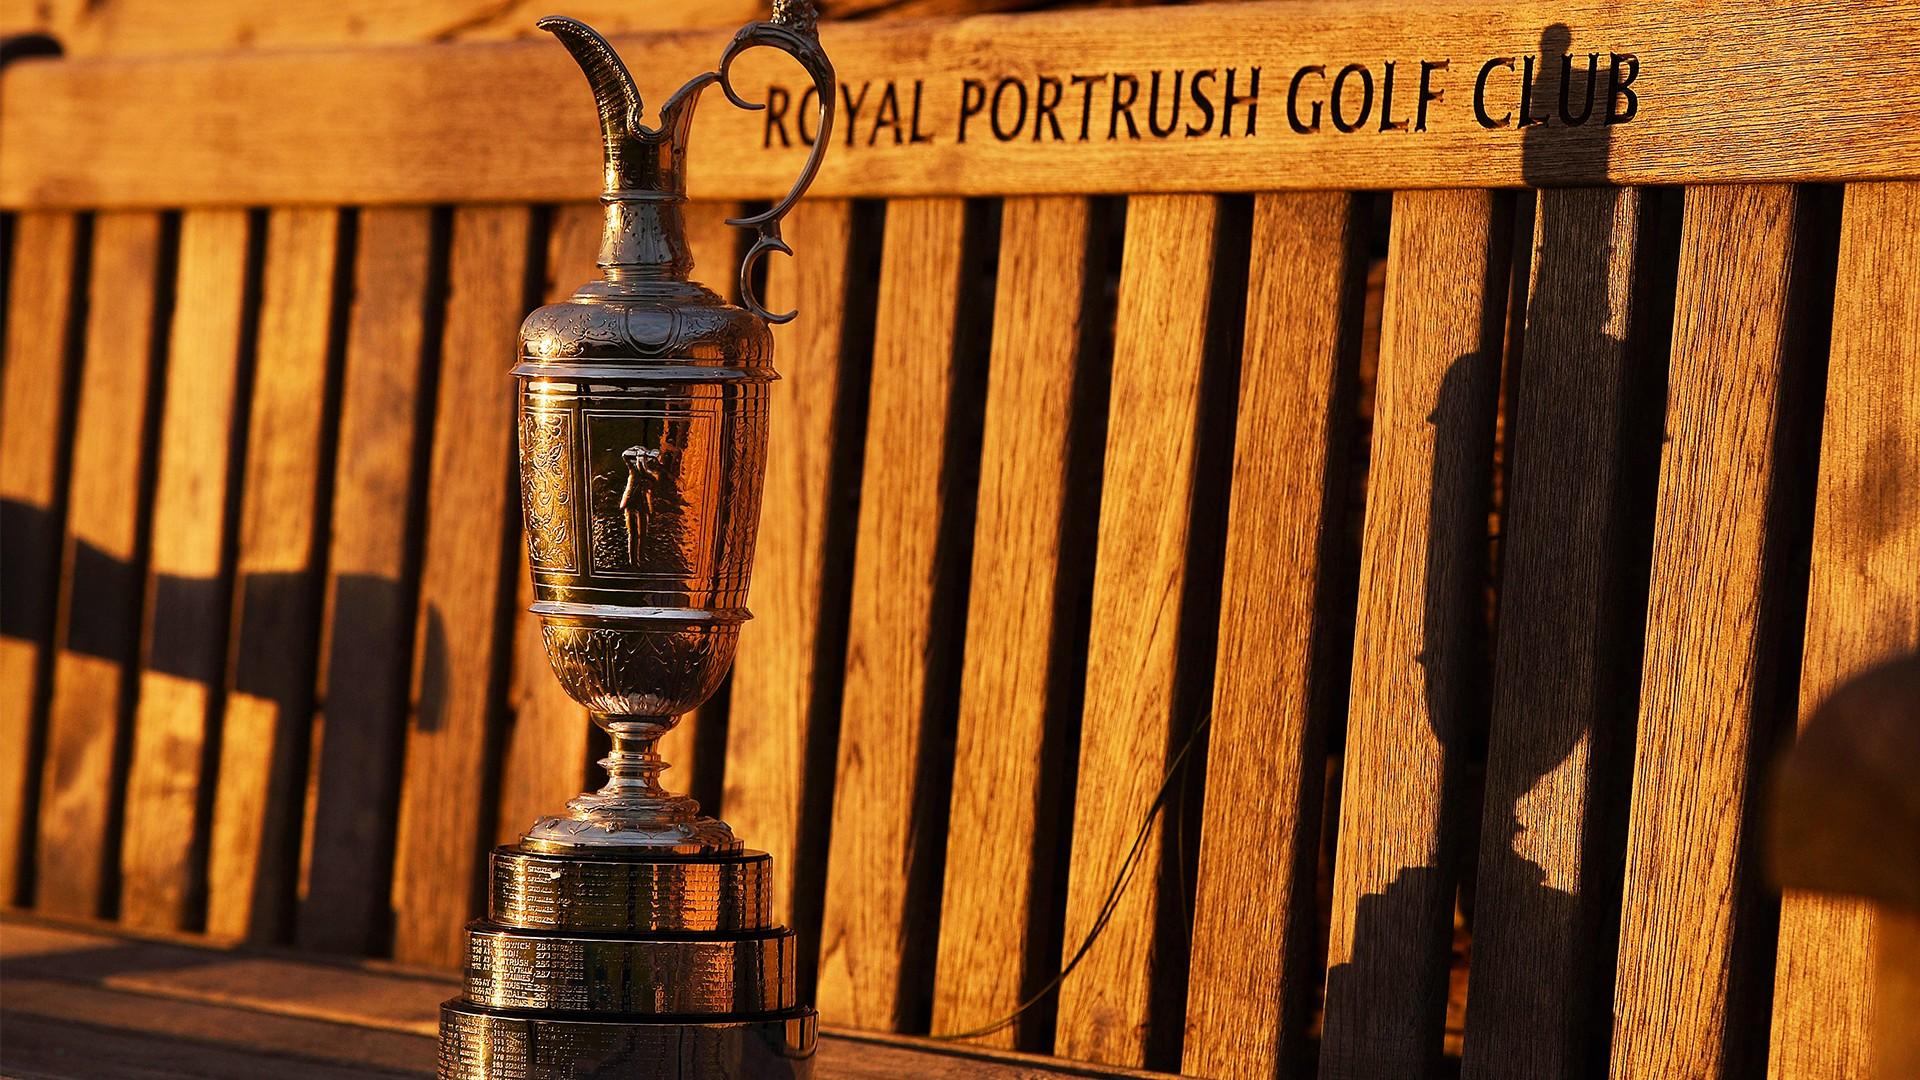 Royal Portrush Golf Club, The Open 2019